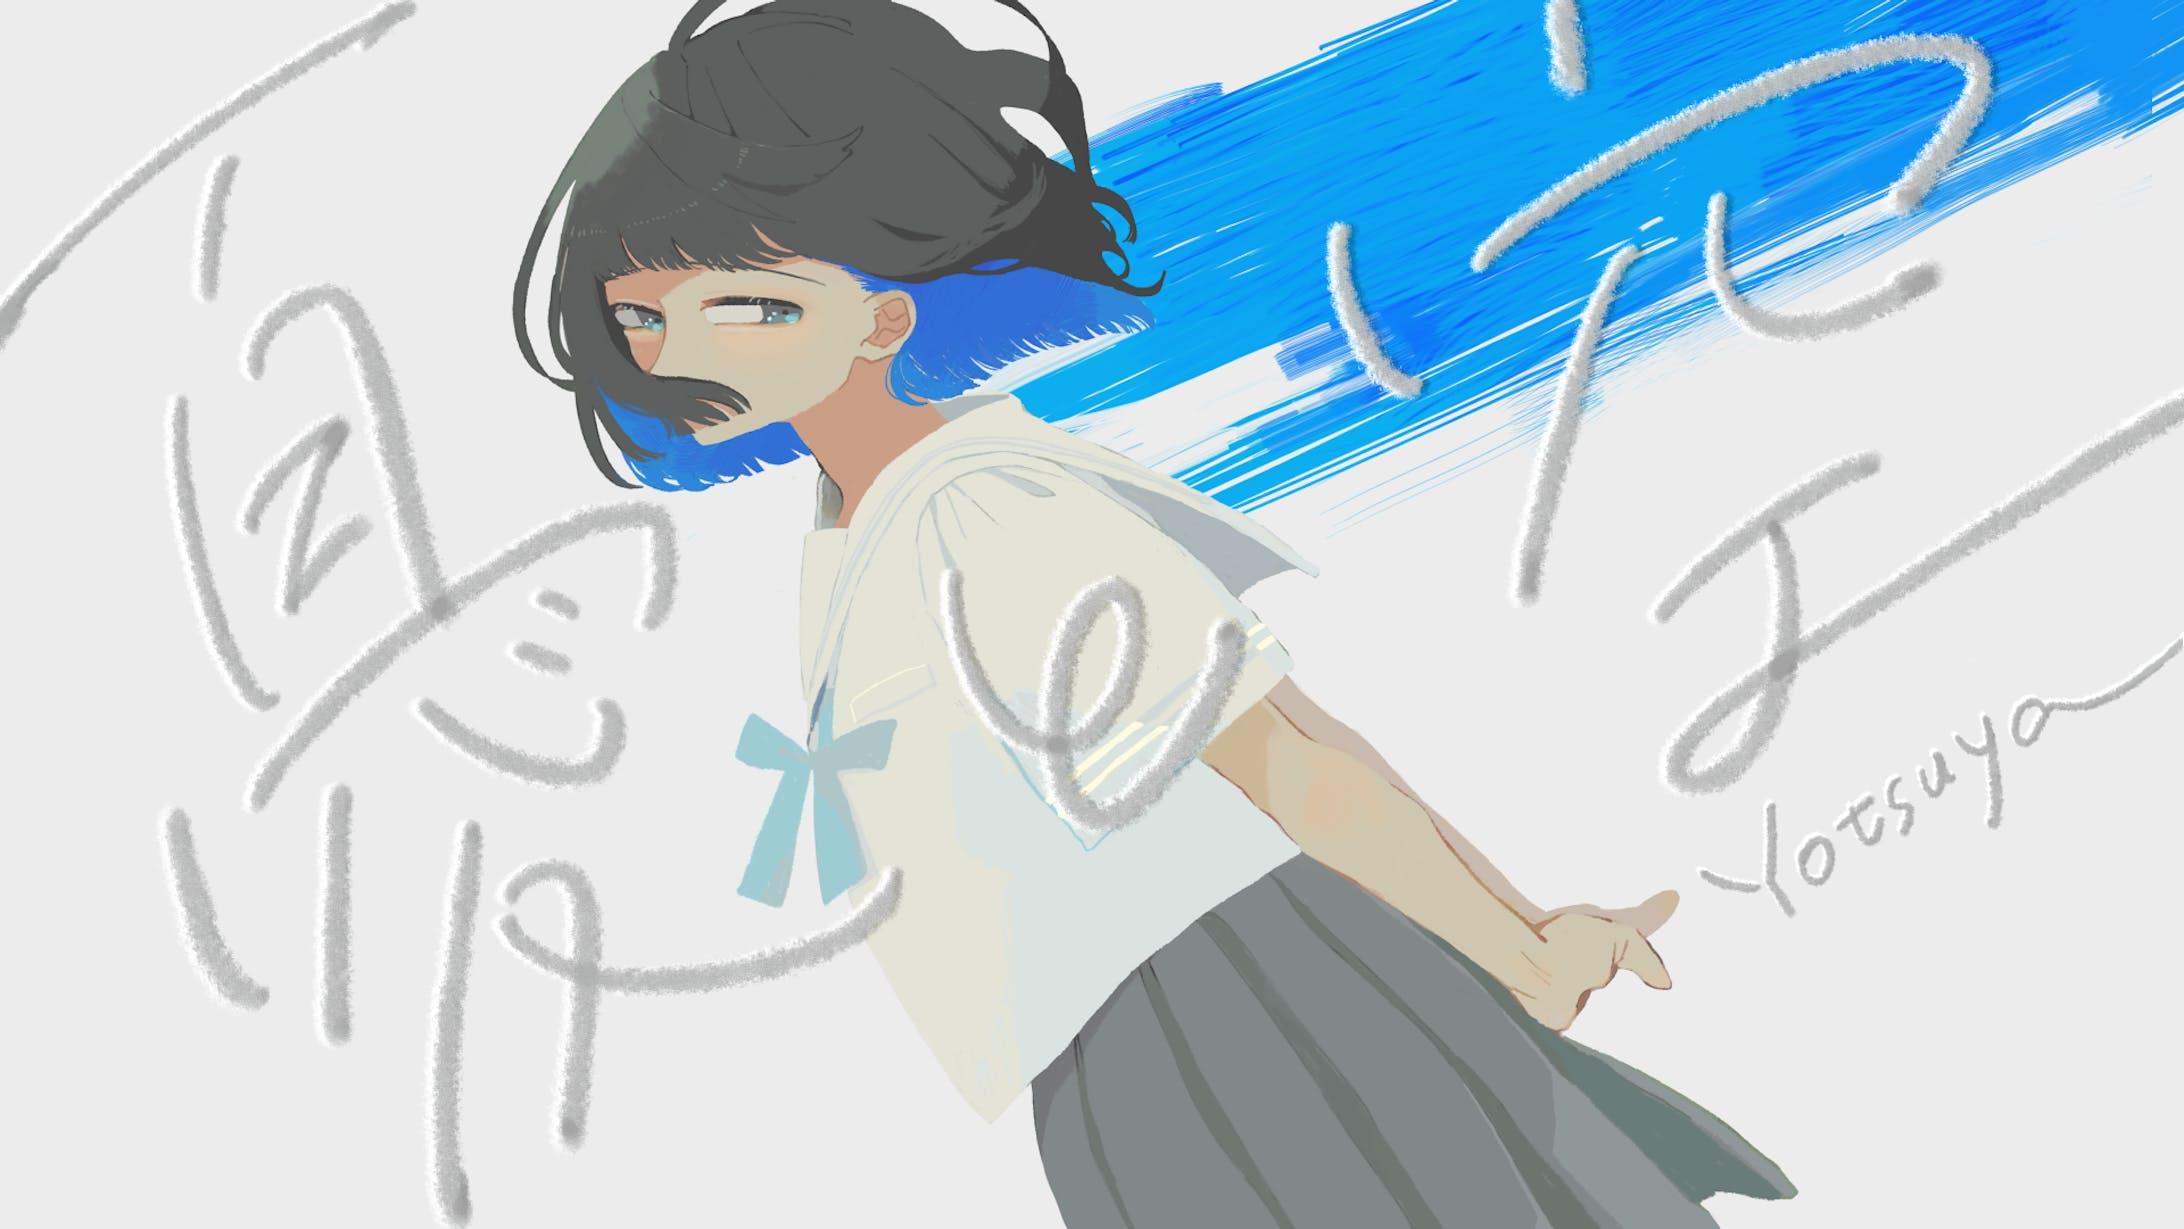 【works】ボカロ曲MVイラスト/題字-1